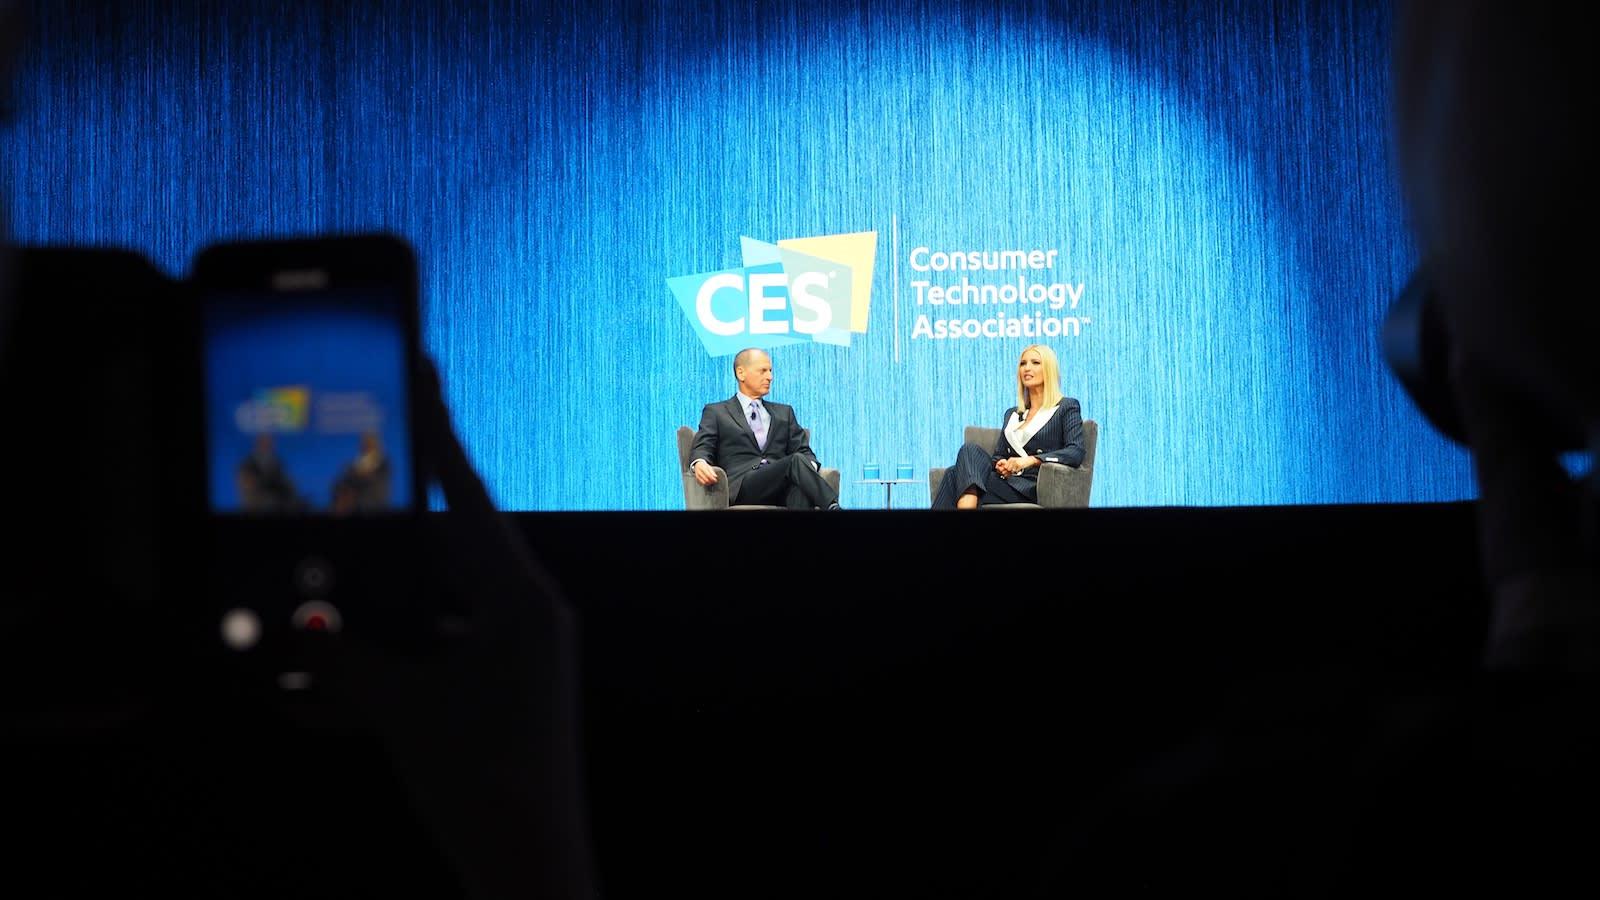 Ivanka Trump at CES 2020